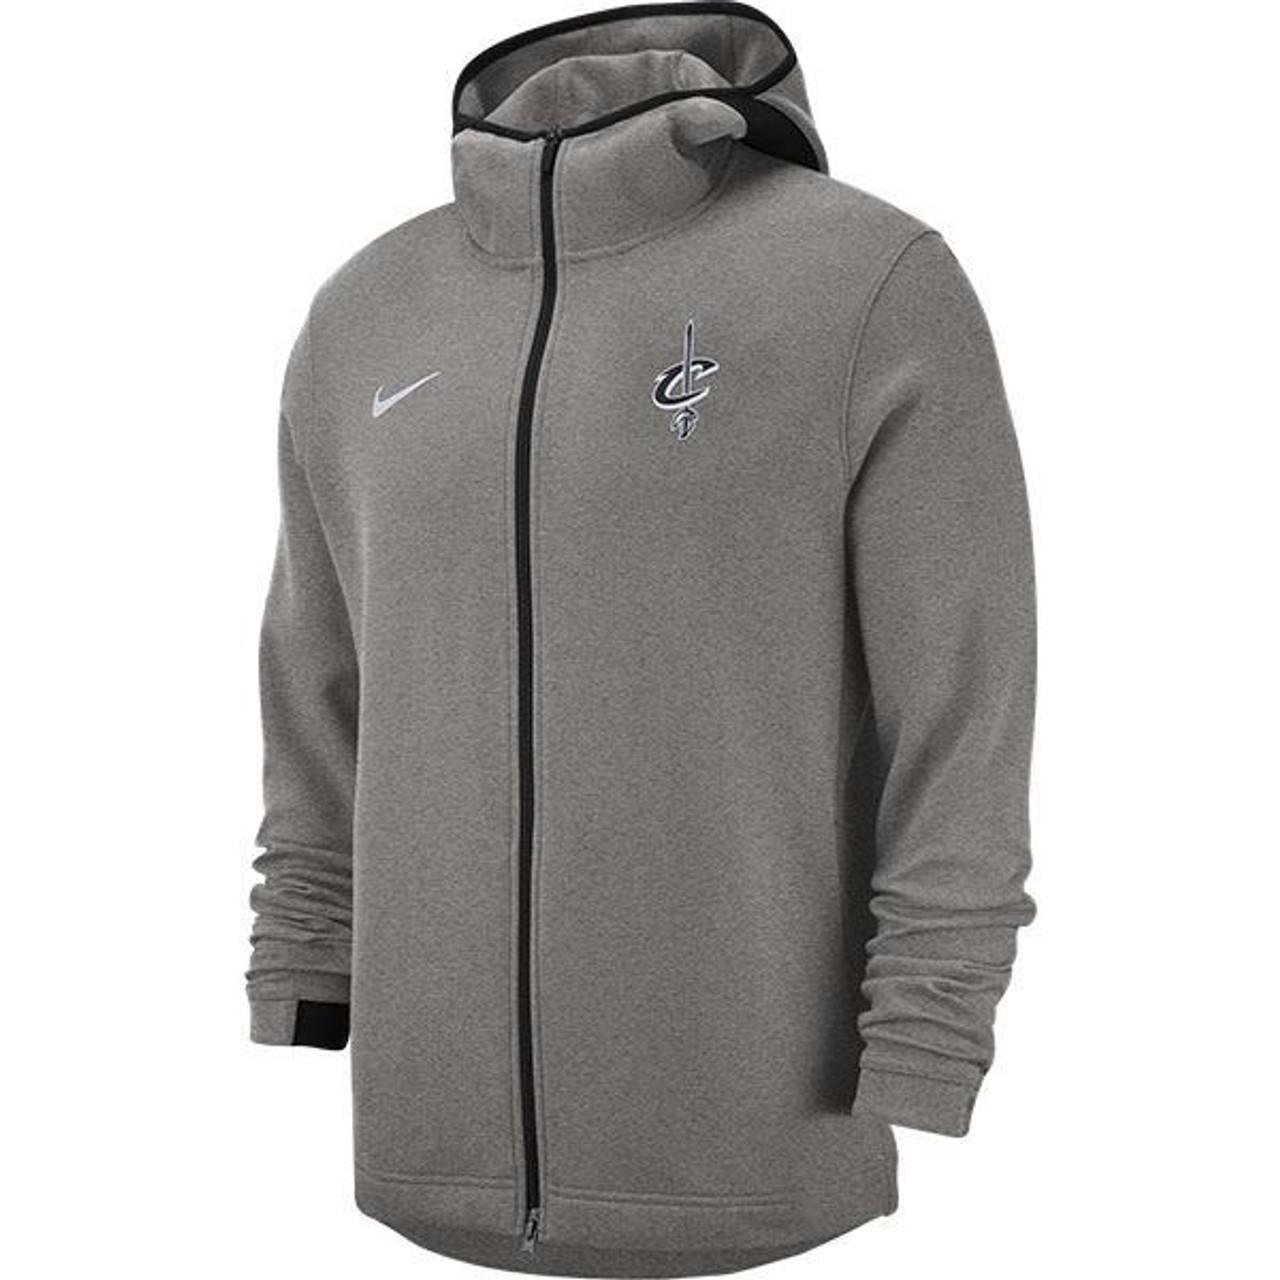 9ffd8af9e911 Nike Gray Showtime Full Zip Hoodie